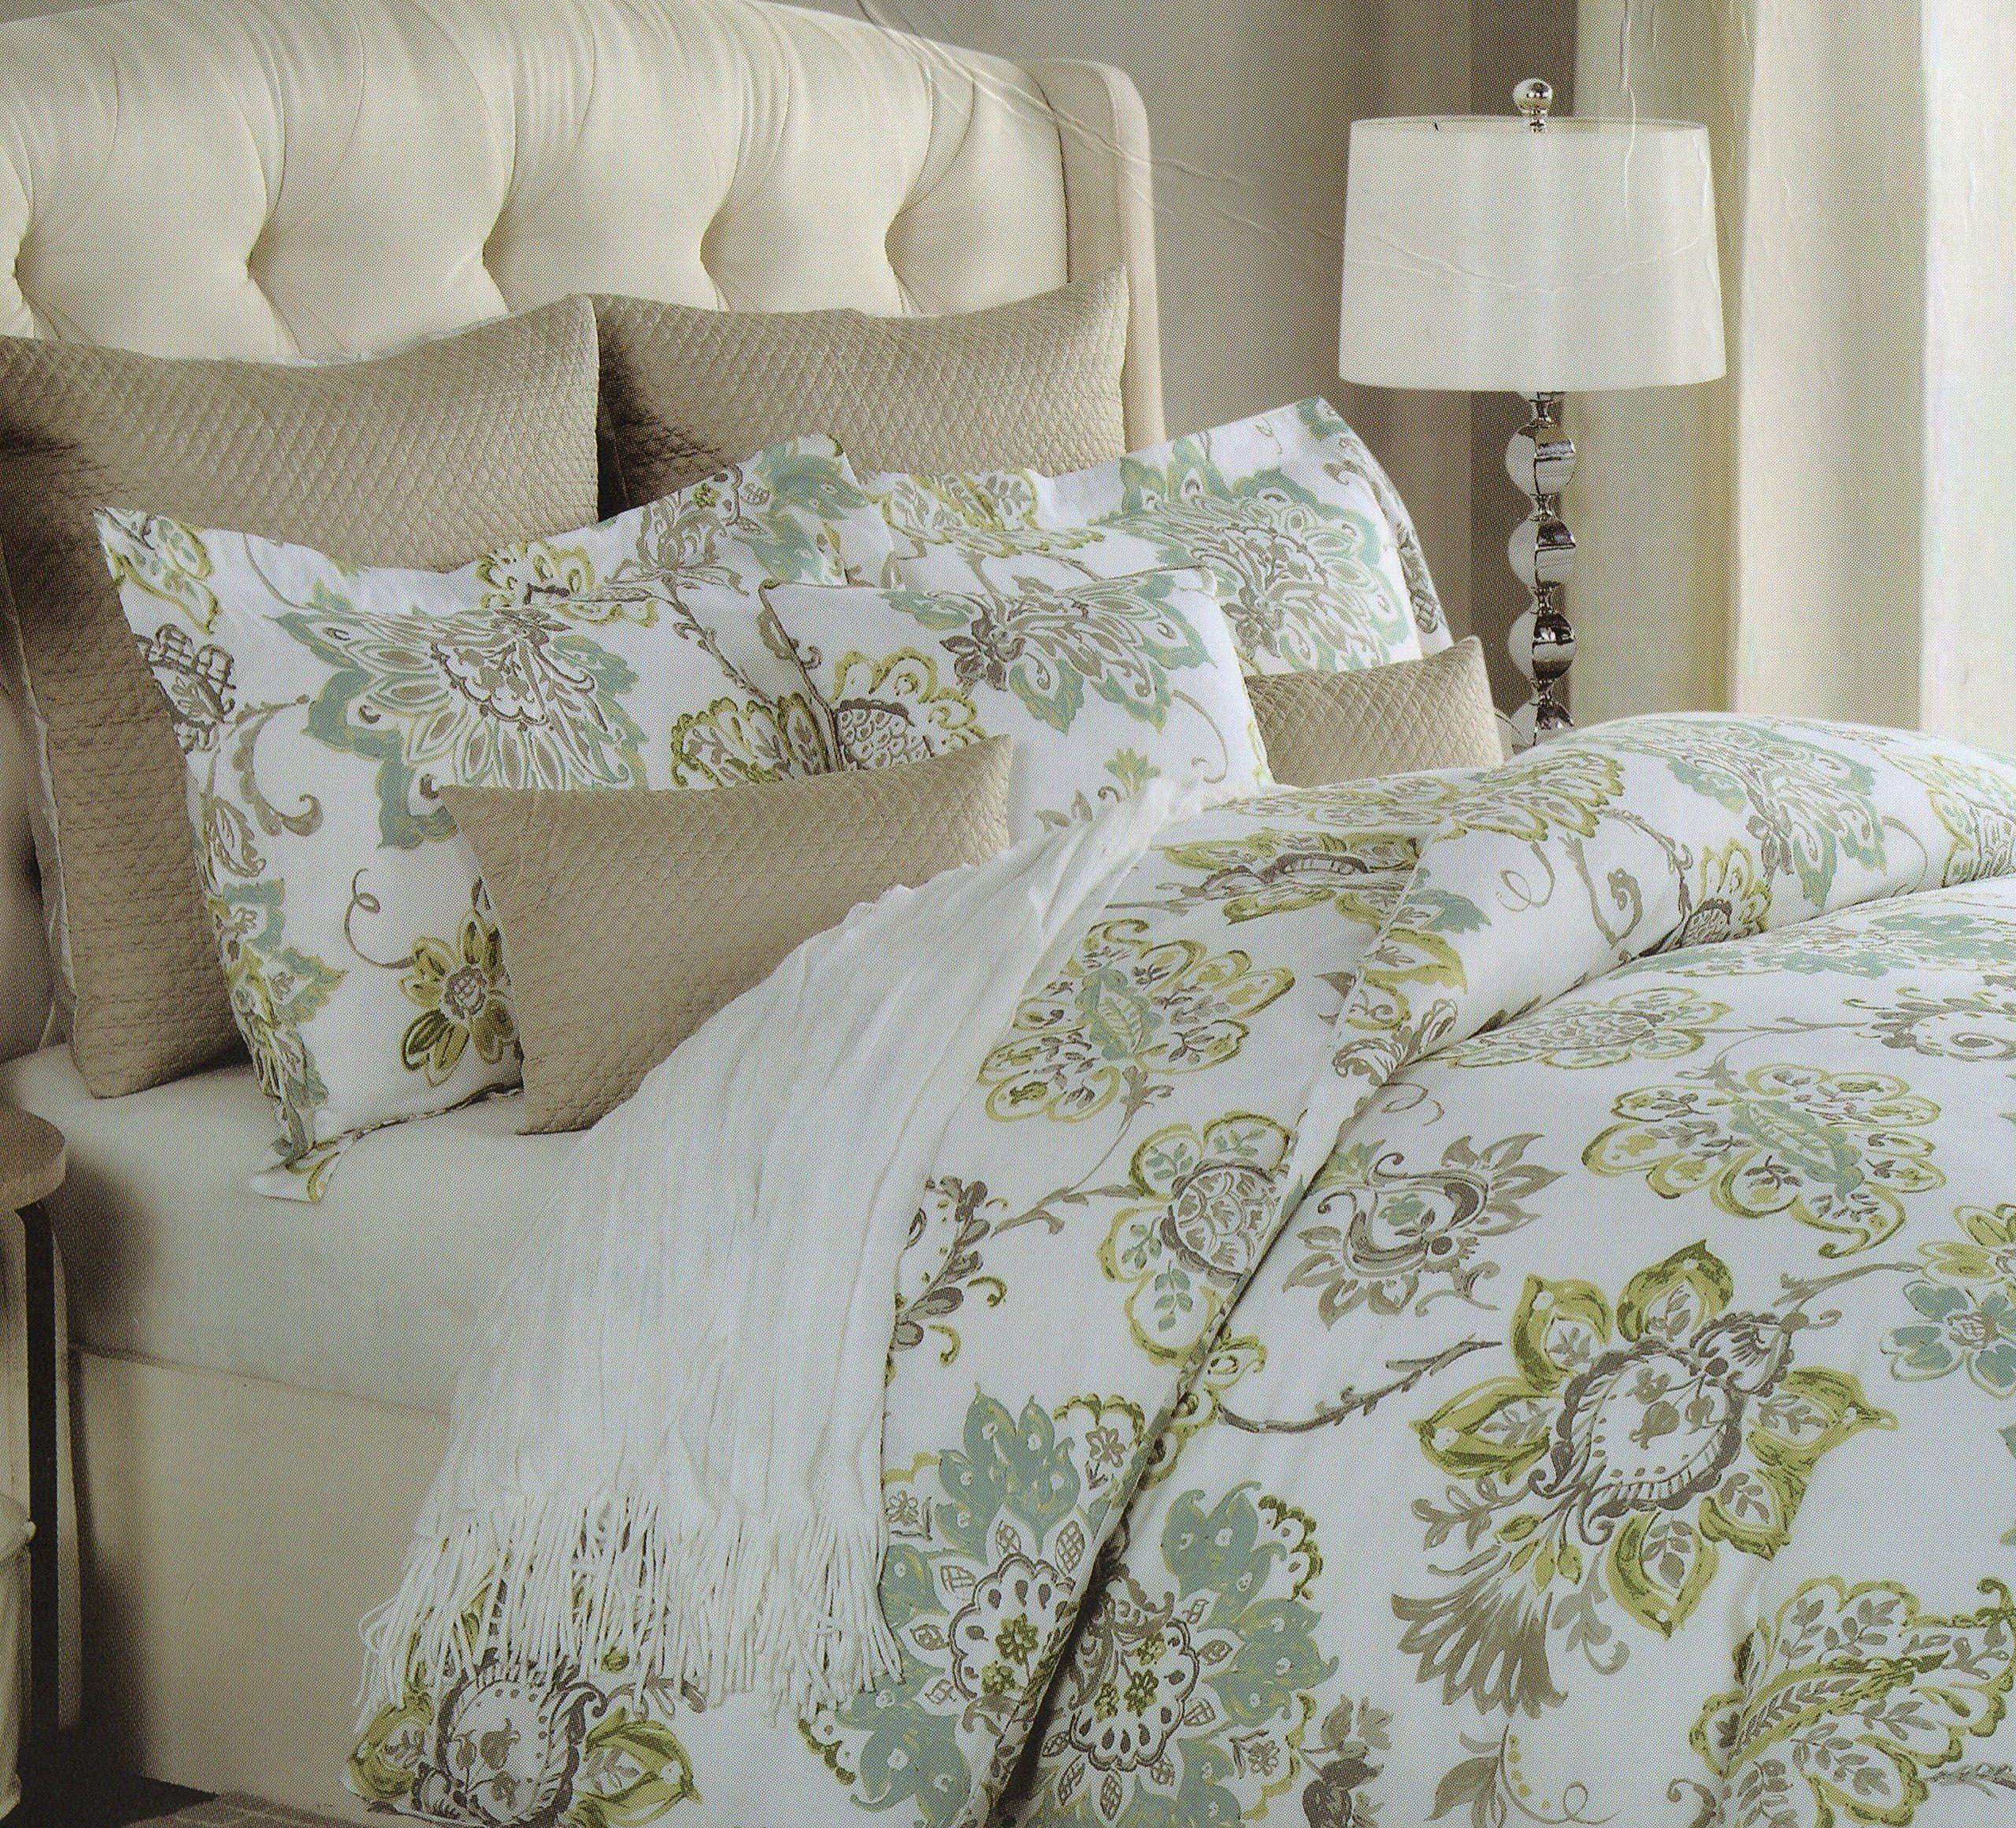 Cynthia Rowley 3pc Duvet Cover Set Large Floral Jacobean